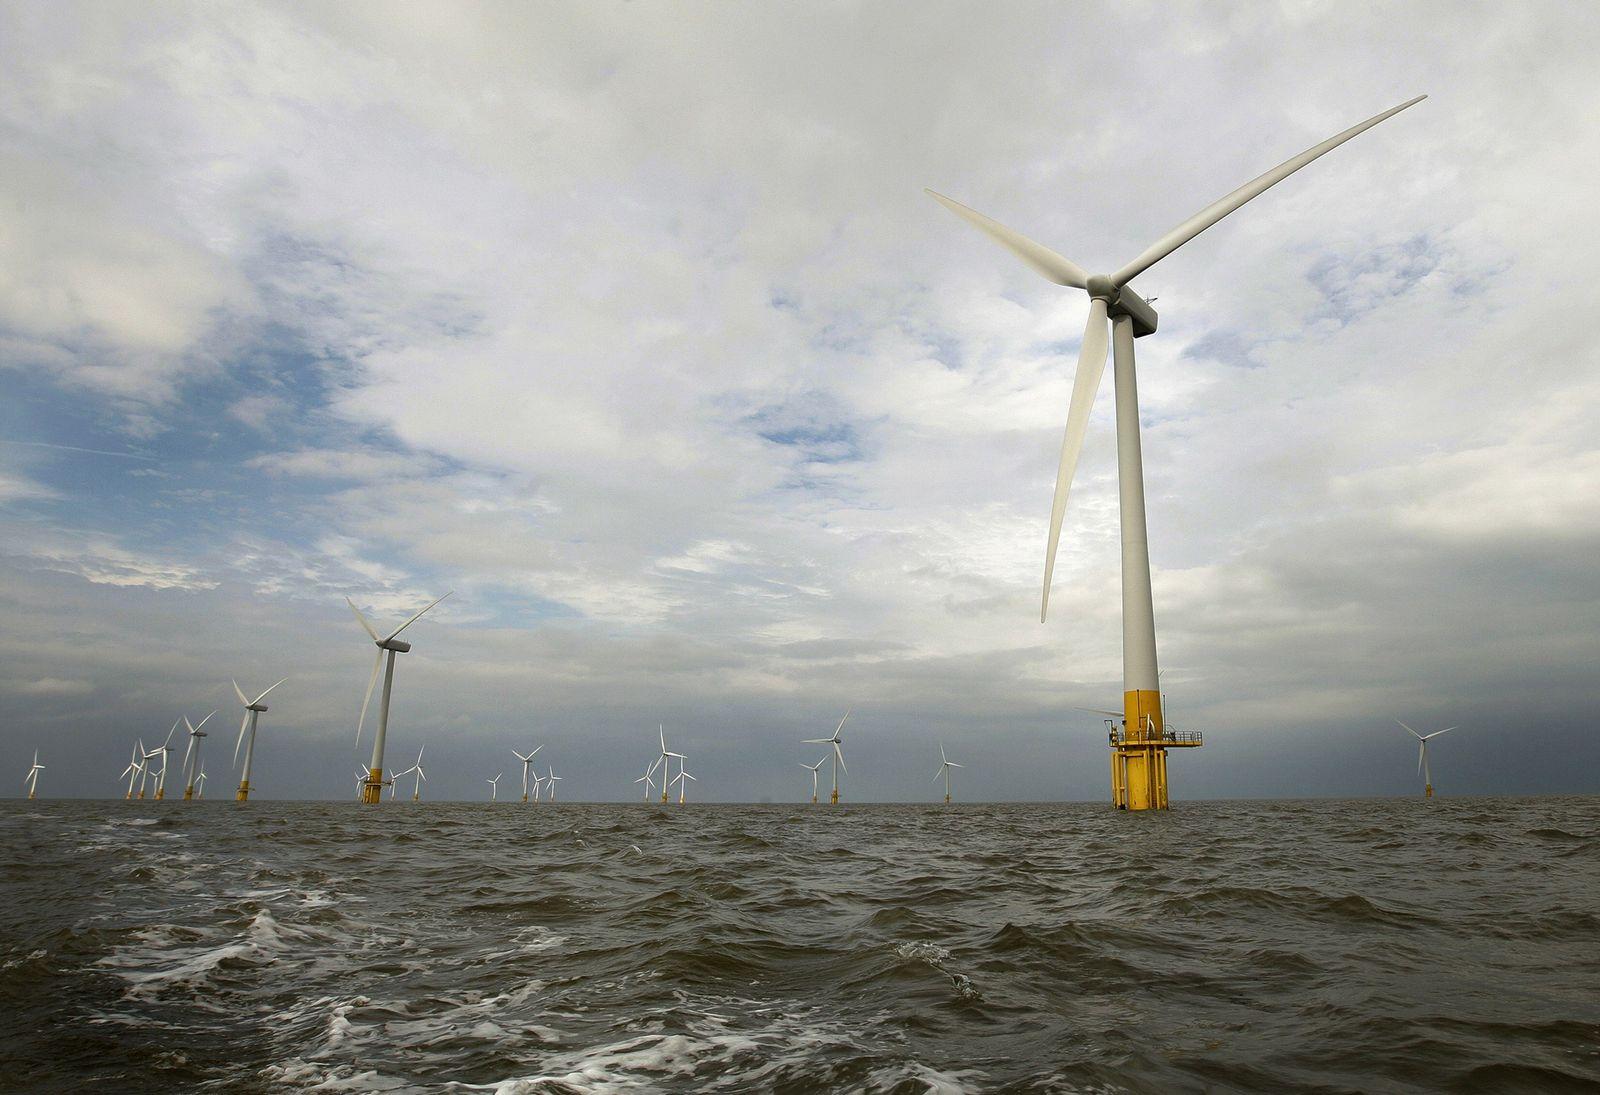 BRITAIN-ALTERNATIVE-WIND-ENERGY